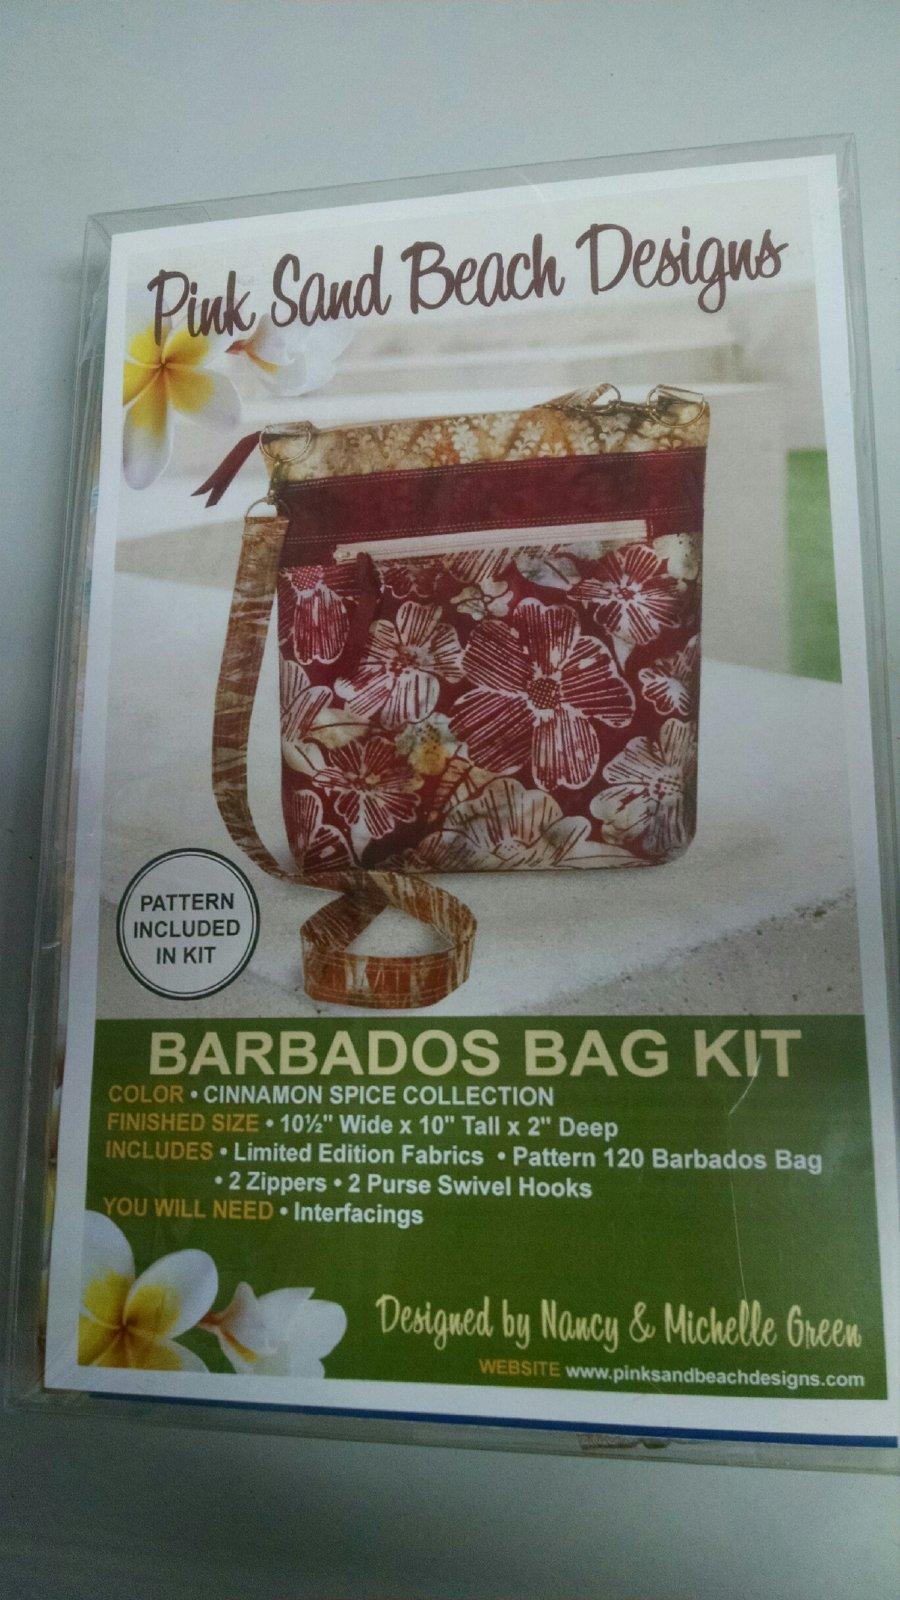 Barbados Bag Cinnamon Spice Kit